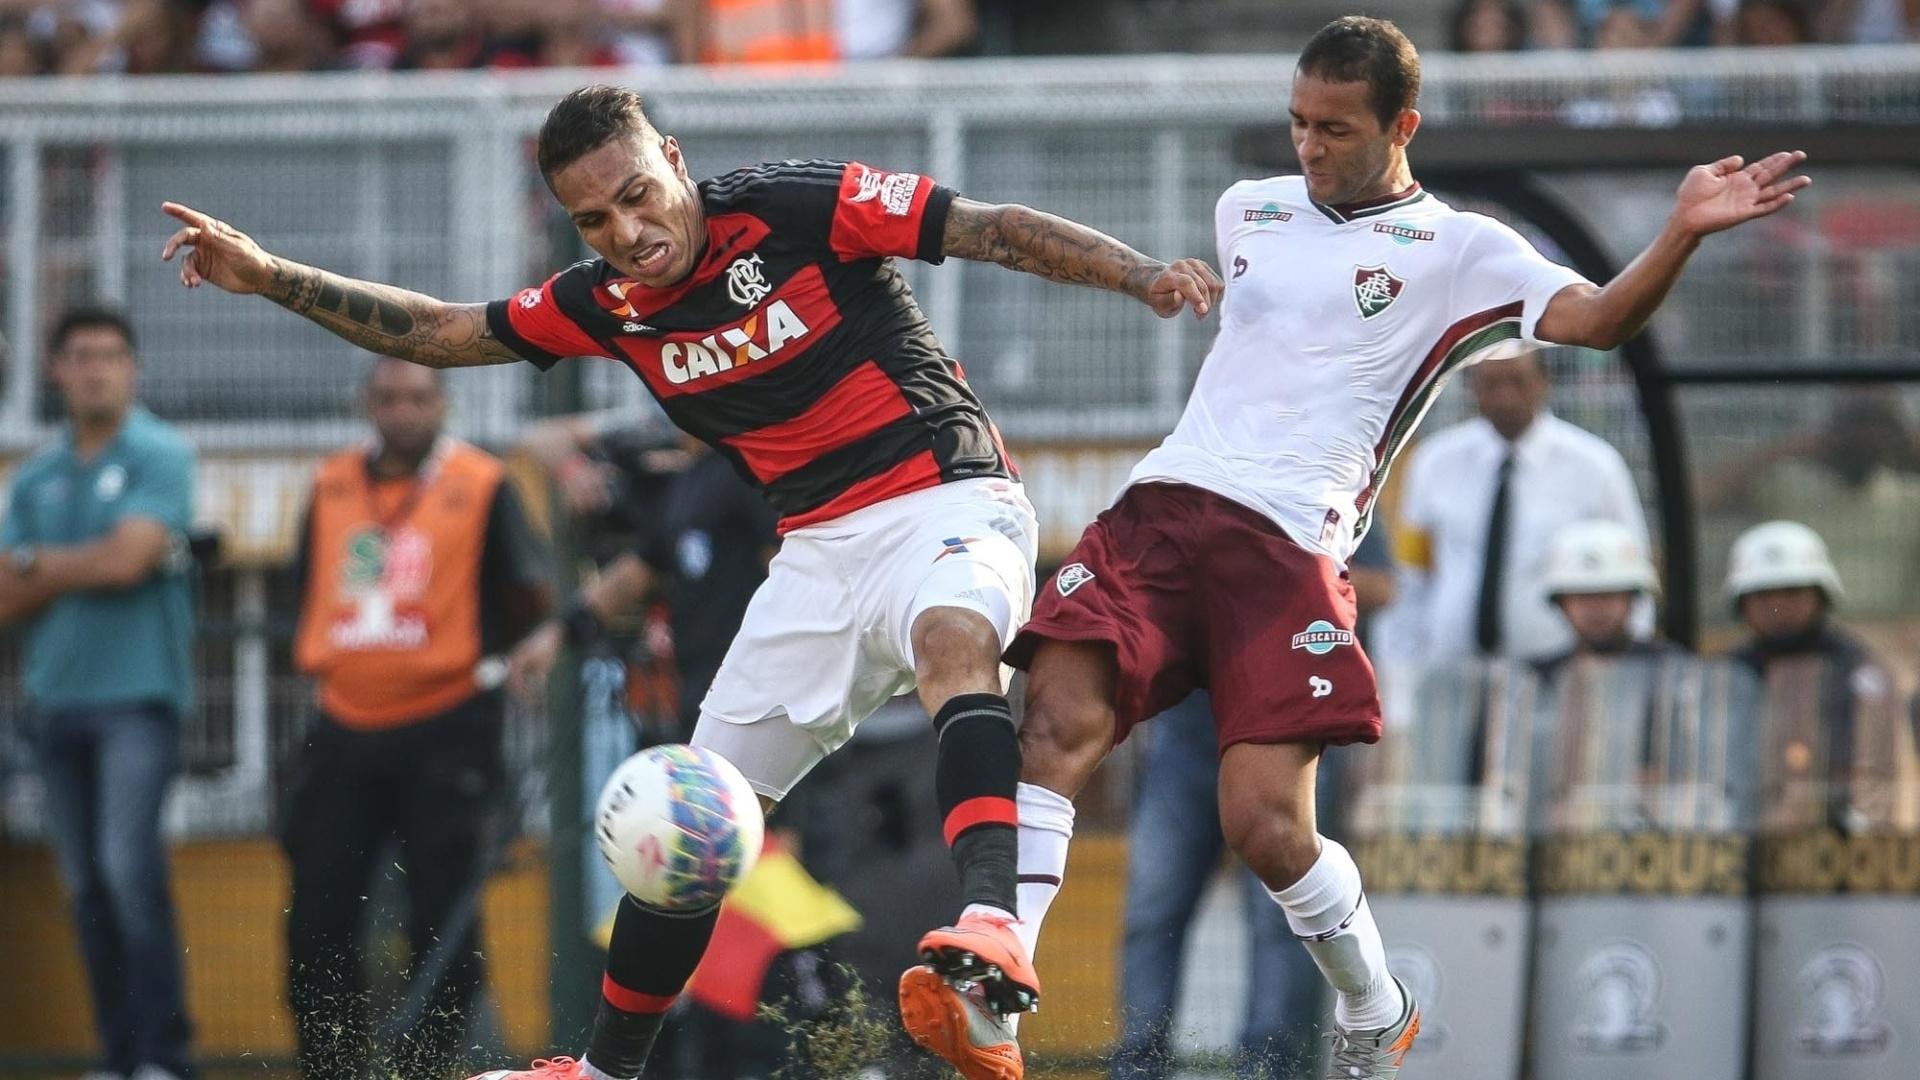 Guerrero disputa bola com Pierre, durante a partida entre Flamengo e Fluminense